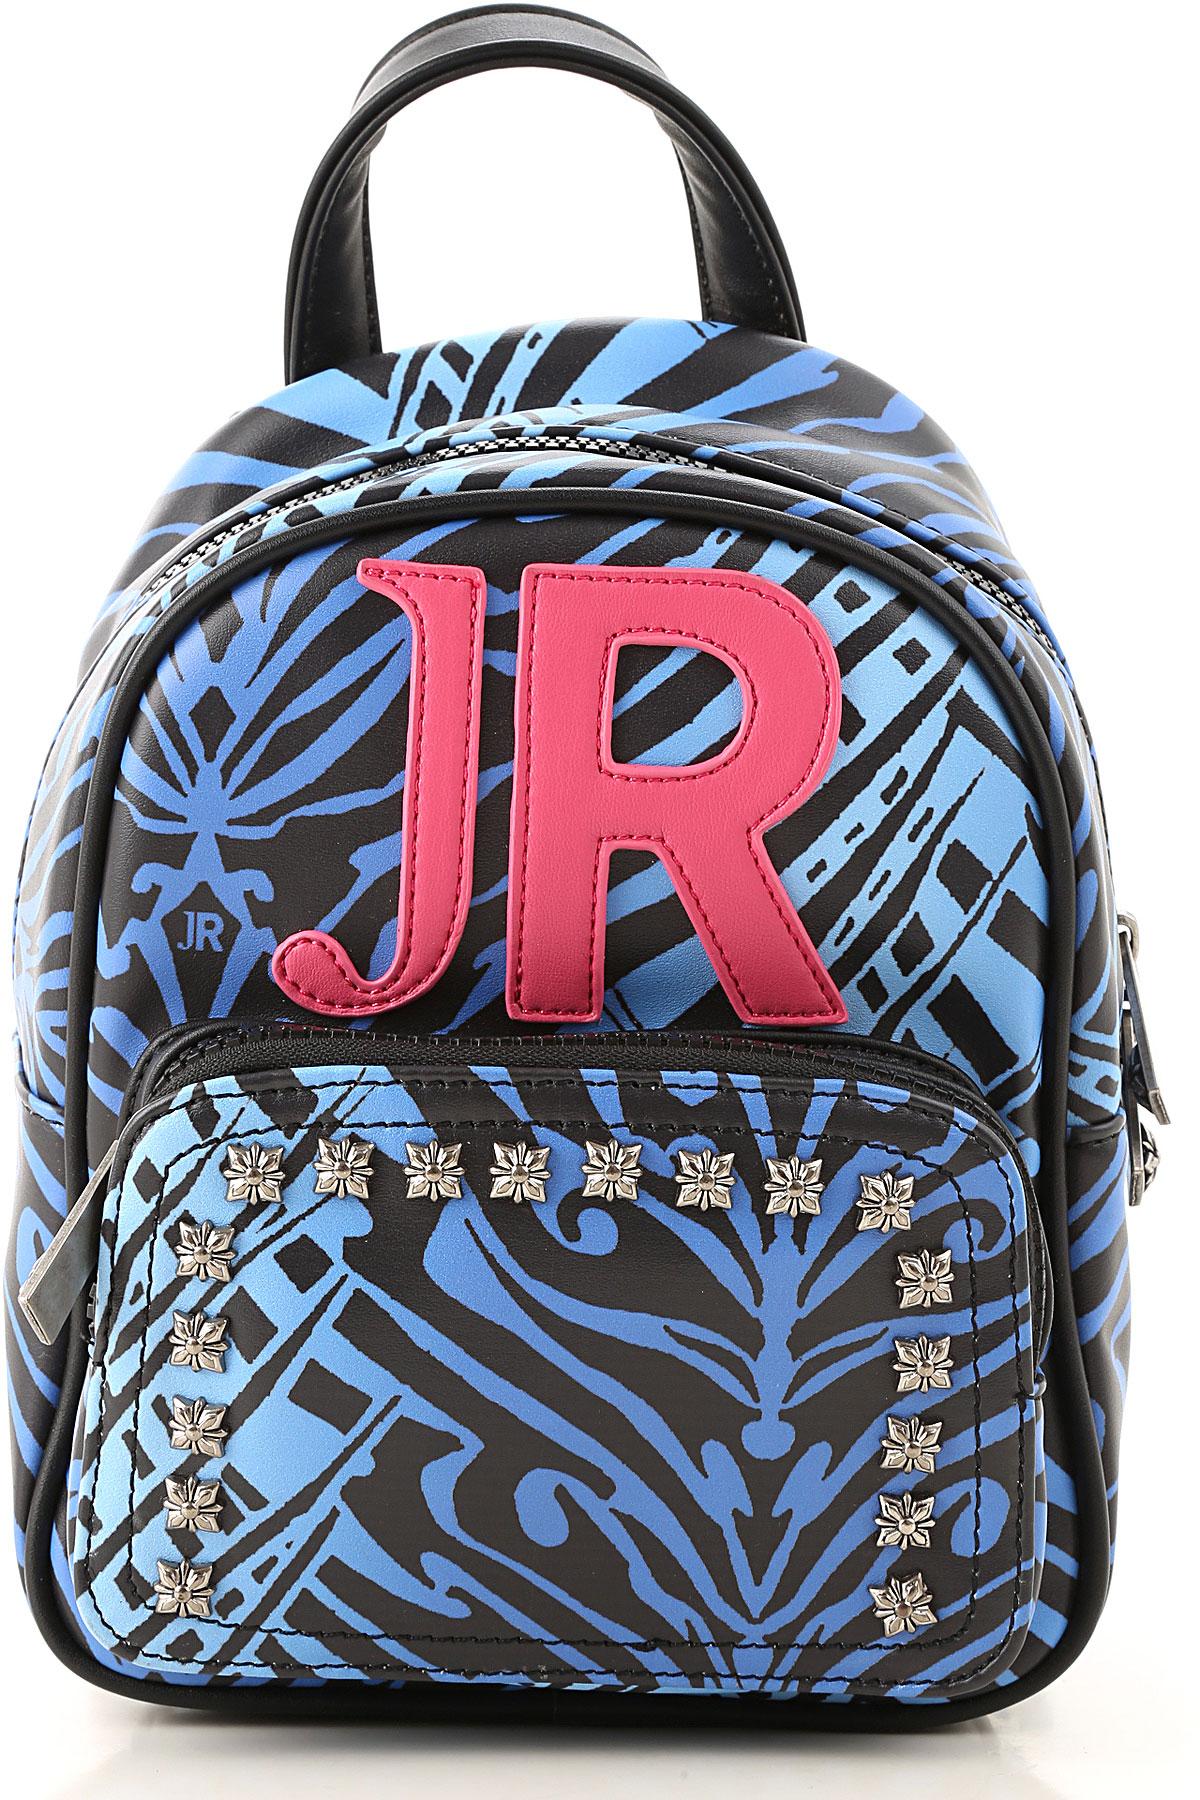 John Richmond Girls Handbag On Sale, Blue, polyurethane, 2019